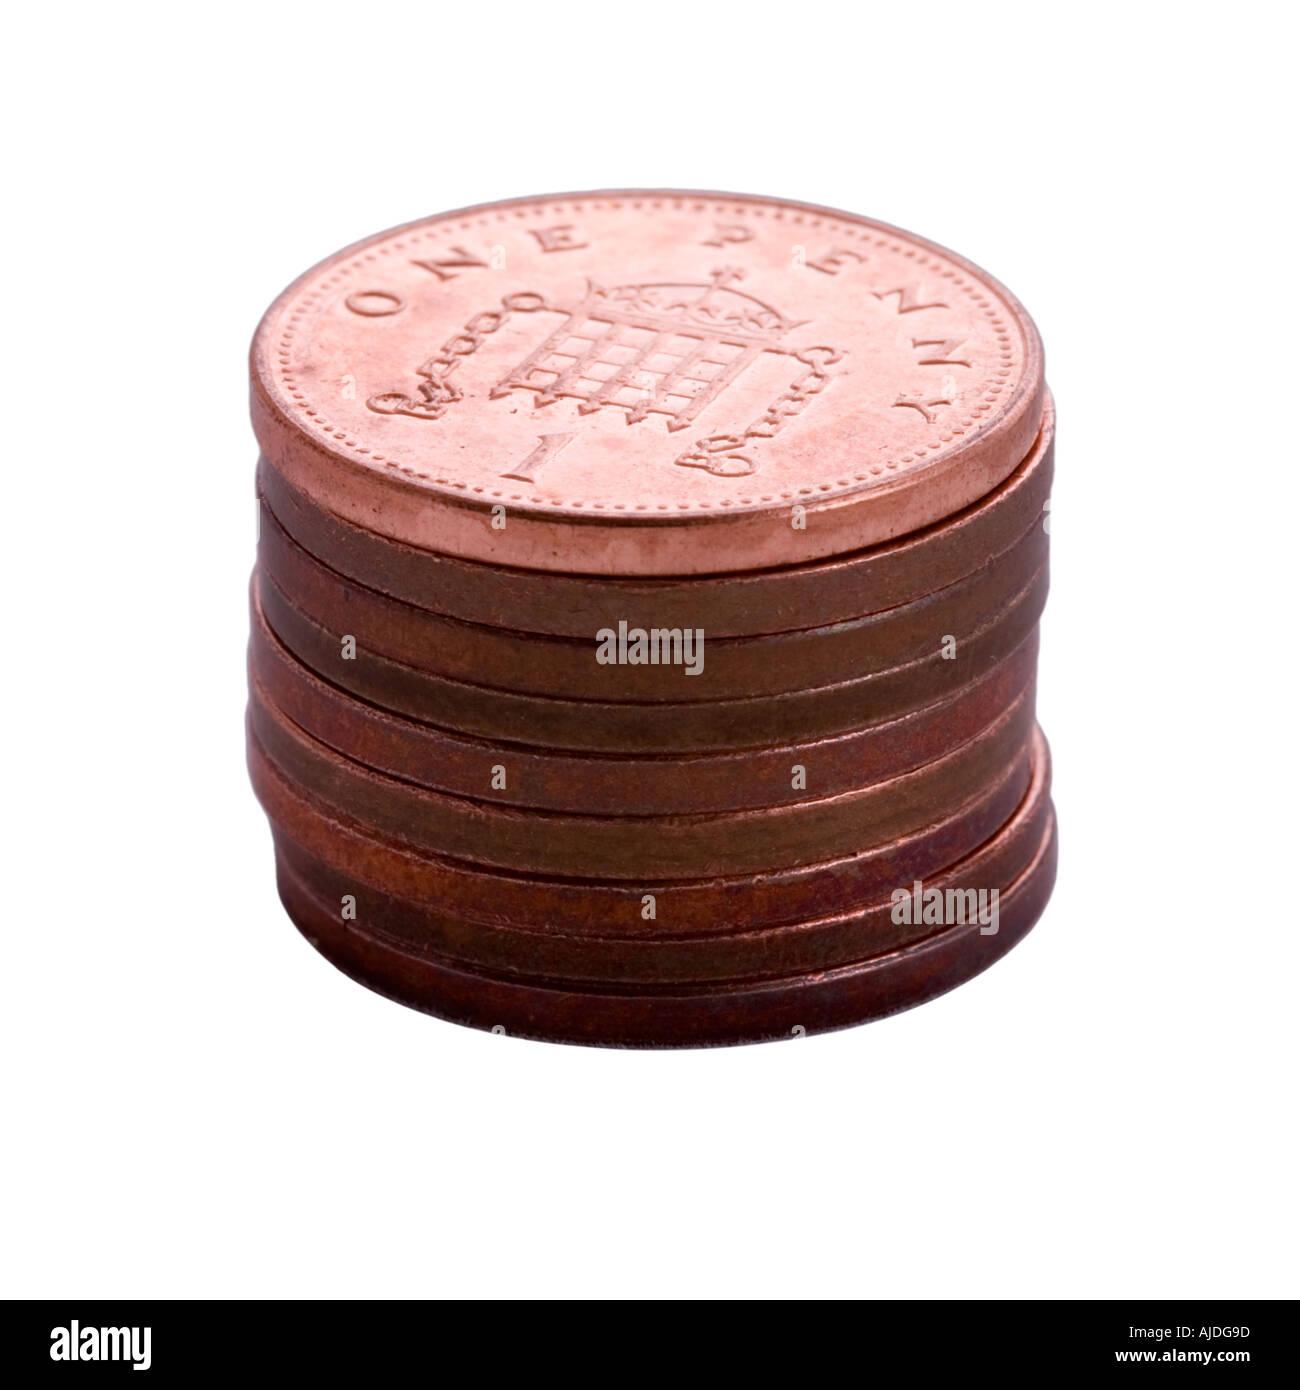 Pile of British pennies - Stock Image